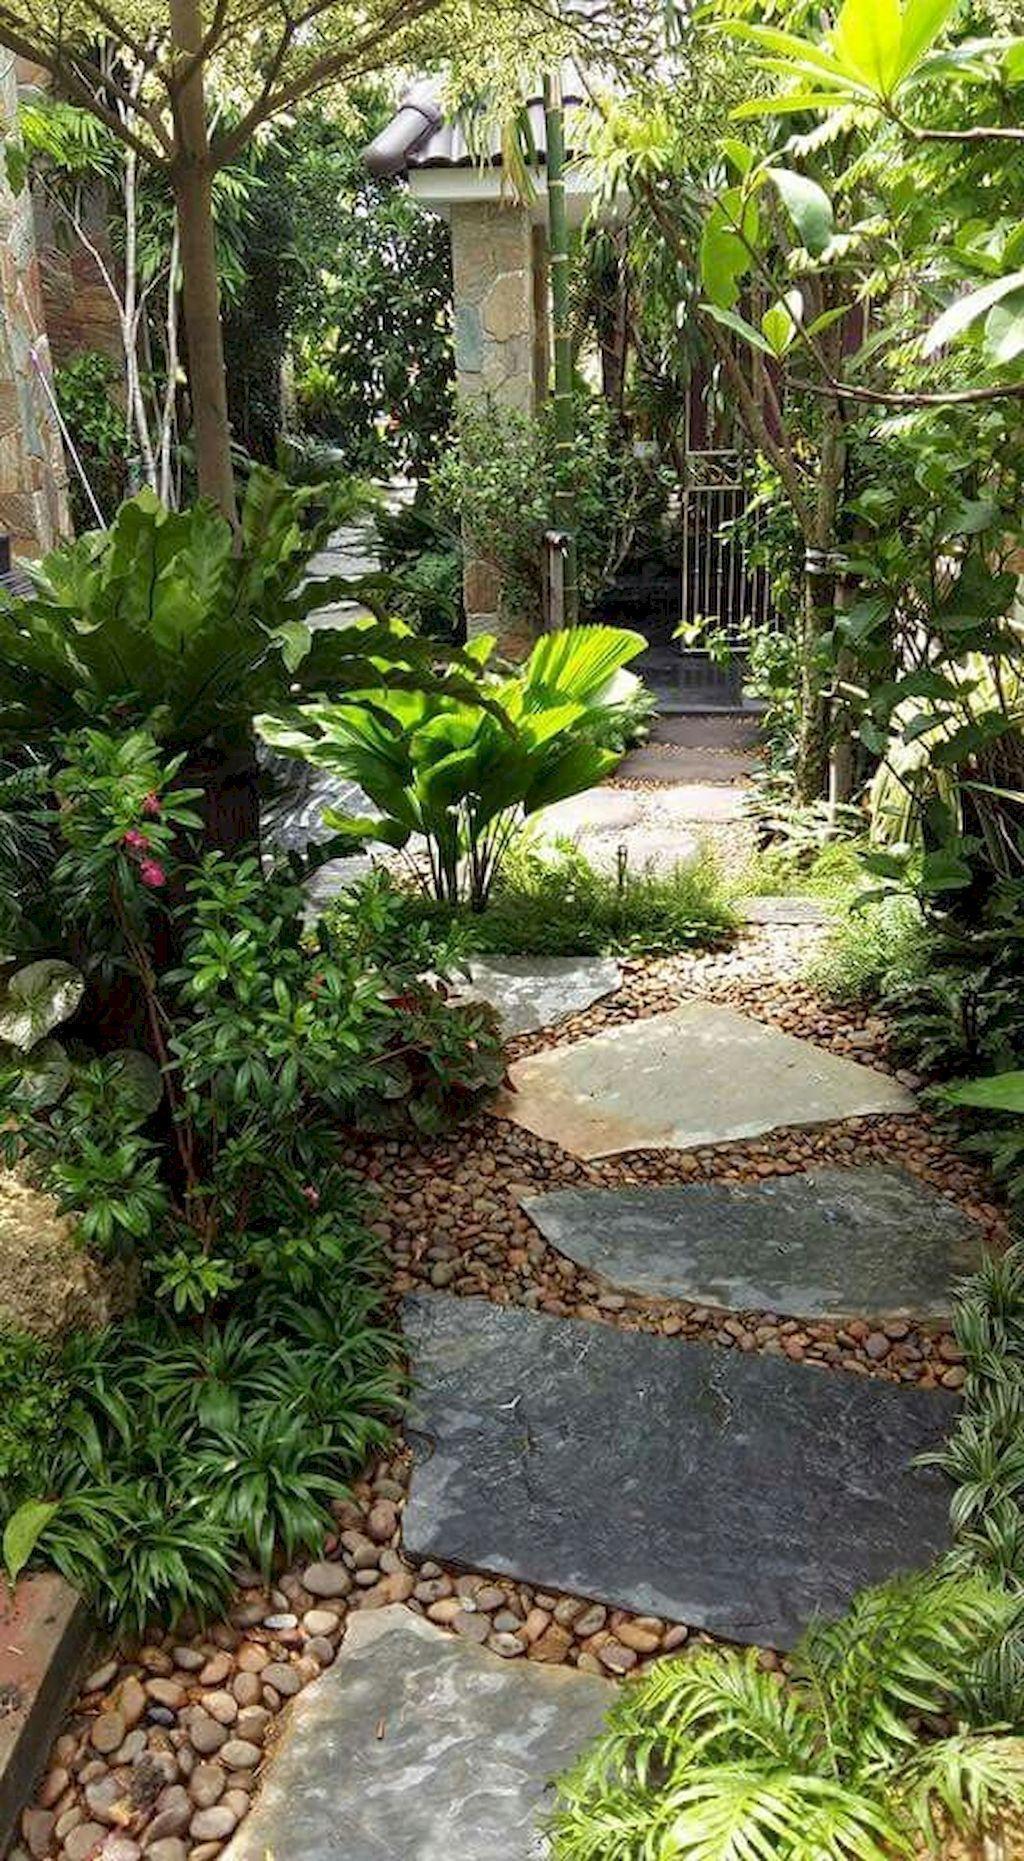 01 beautiful front yard pathway landscaping ideas is part of Pathway landscaping, Front yard garden, Shade garden, Backyard landscaping designs, Side garden, Rock garden - 01 beautiful front yard pathway landscaping ideas